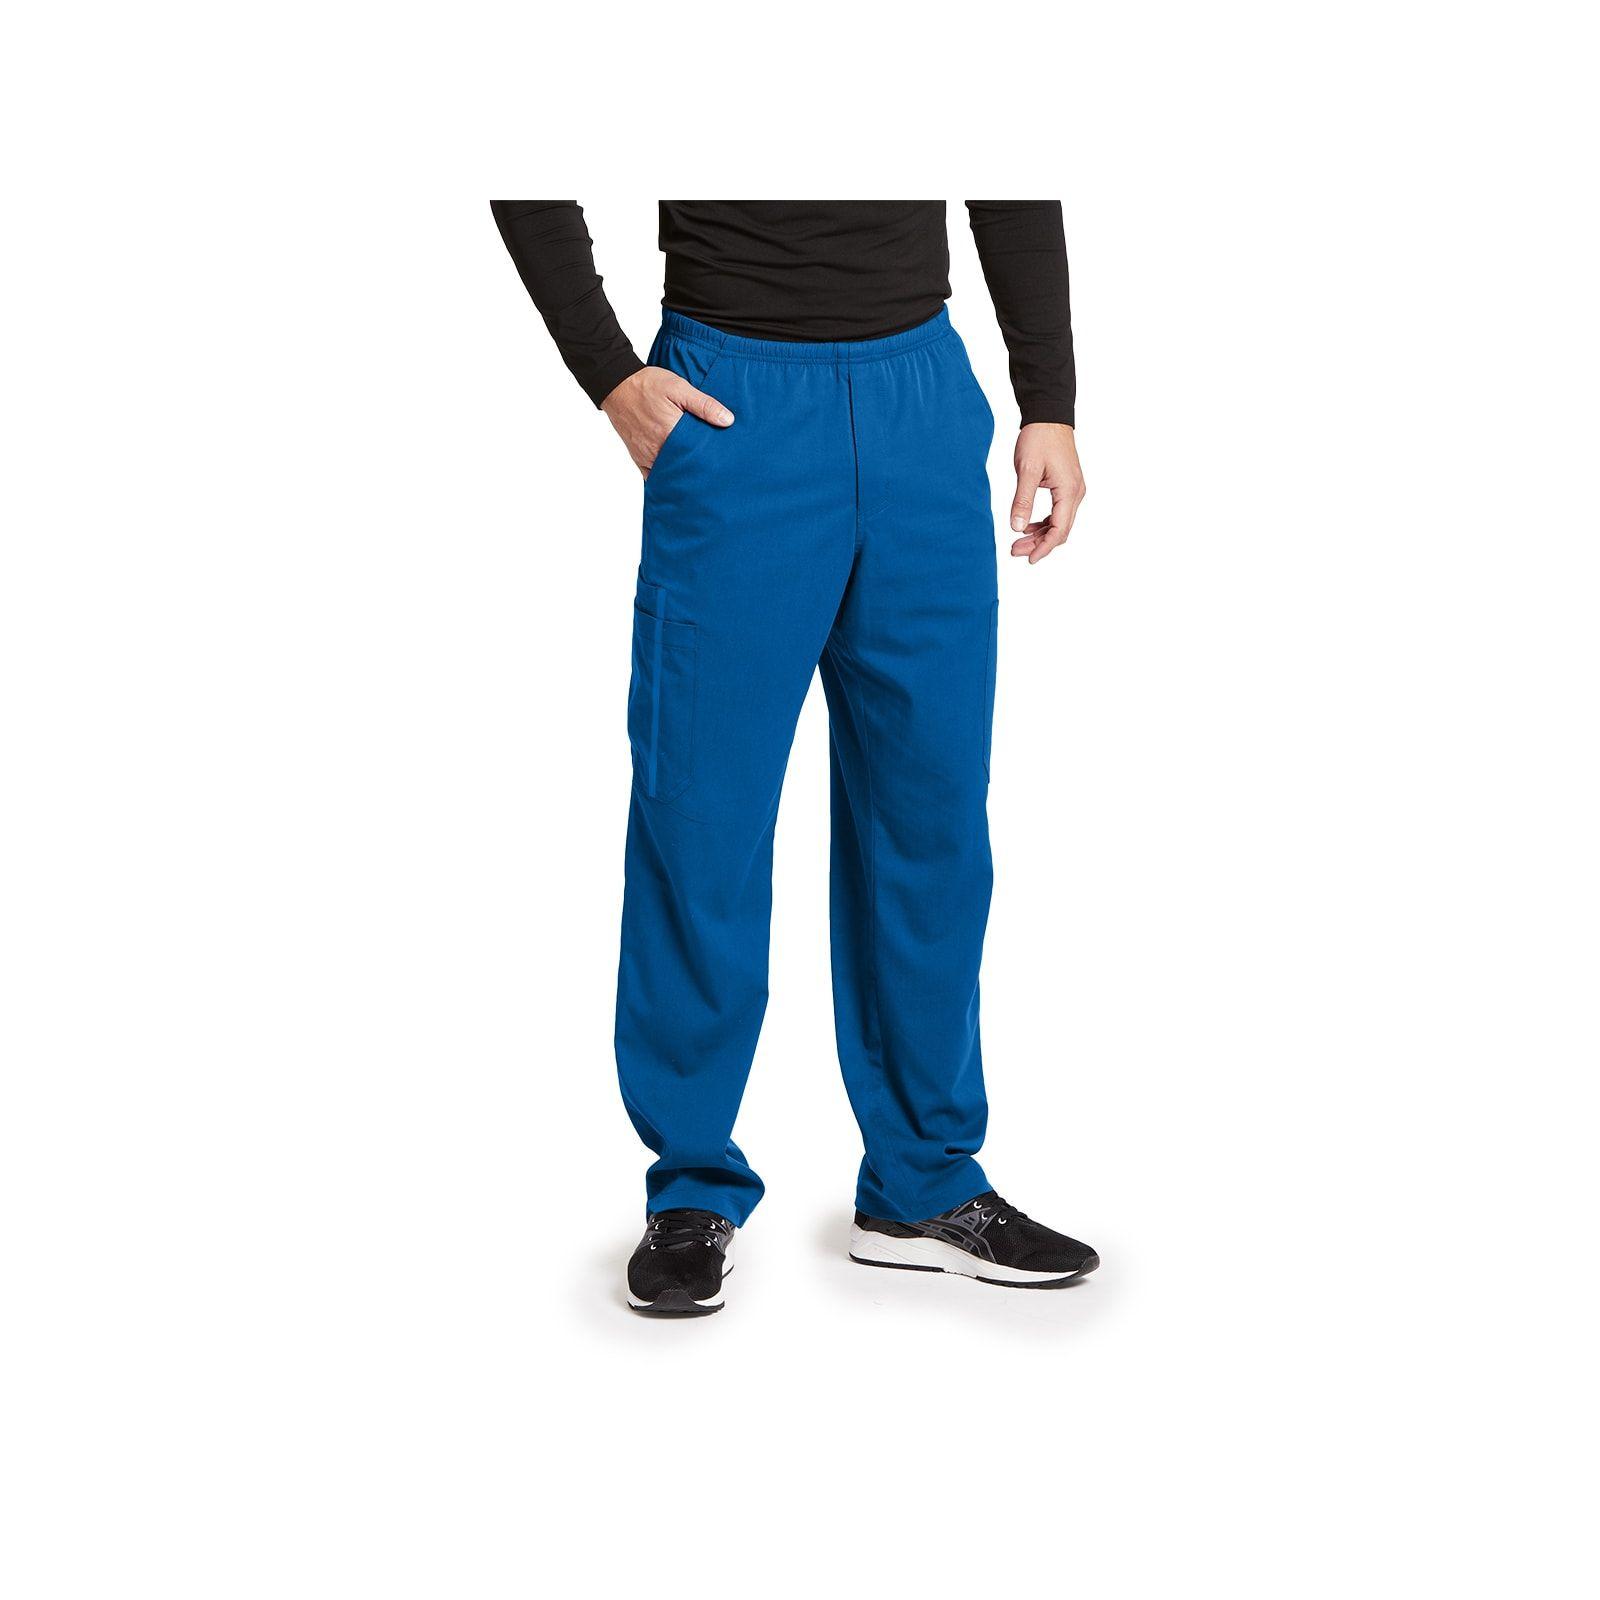 "Pantalon médical homme, couleur bleu royal vue de face, collection ""Grey's Anatomy Impact"", Barco (0219-)"